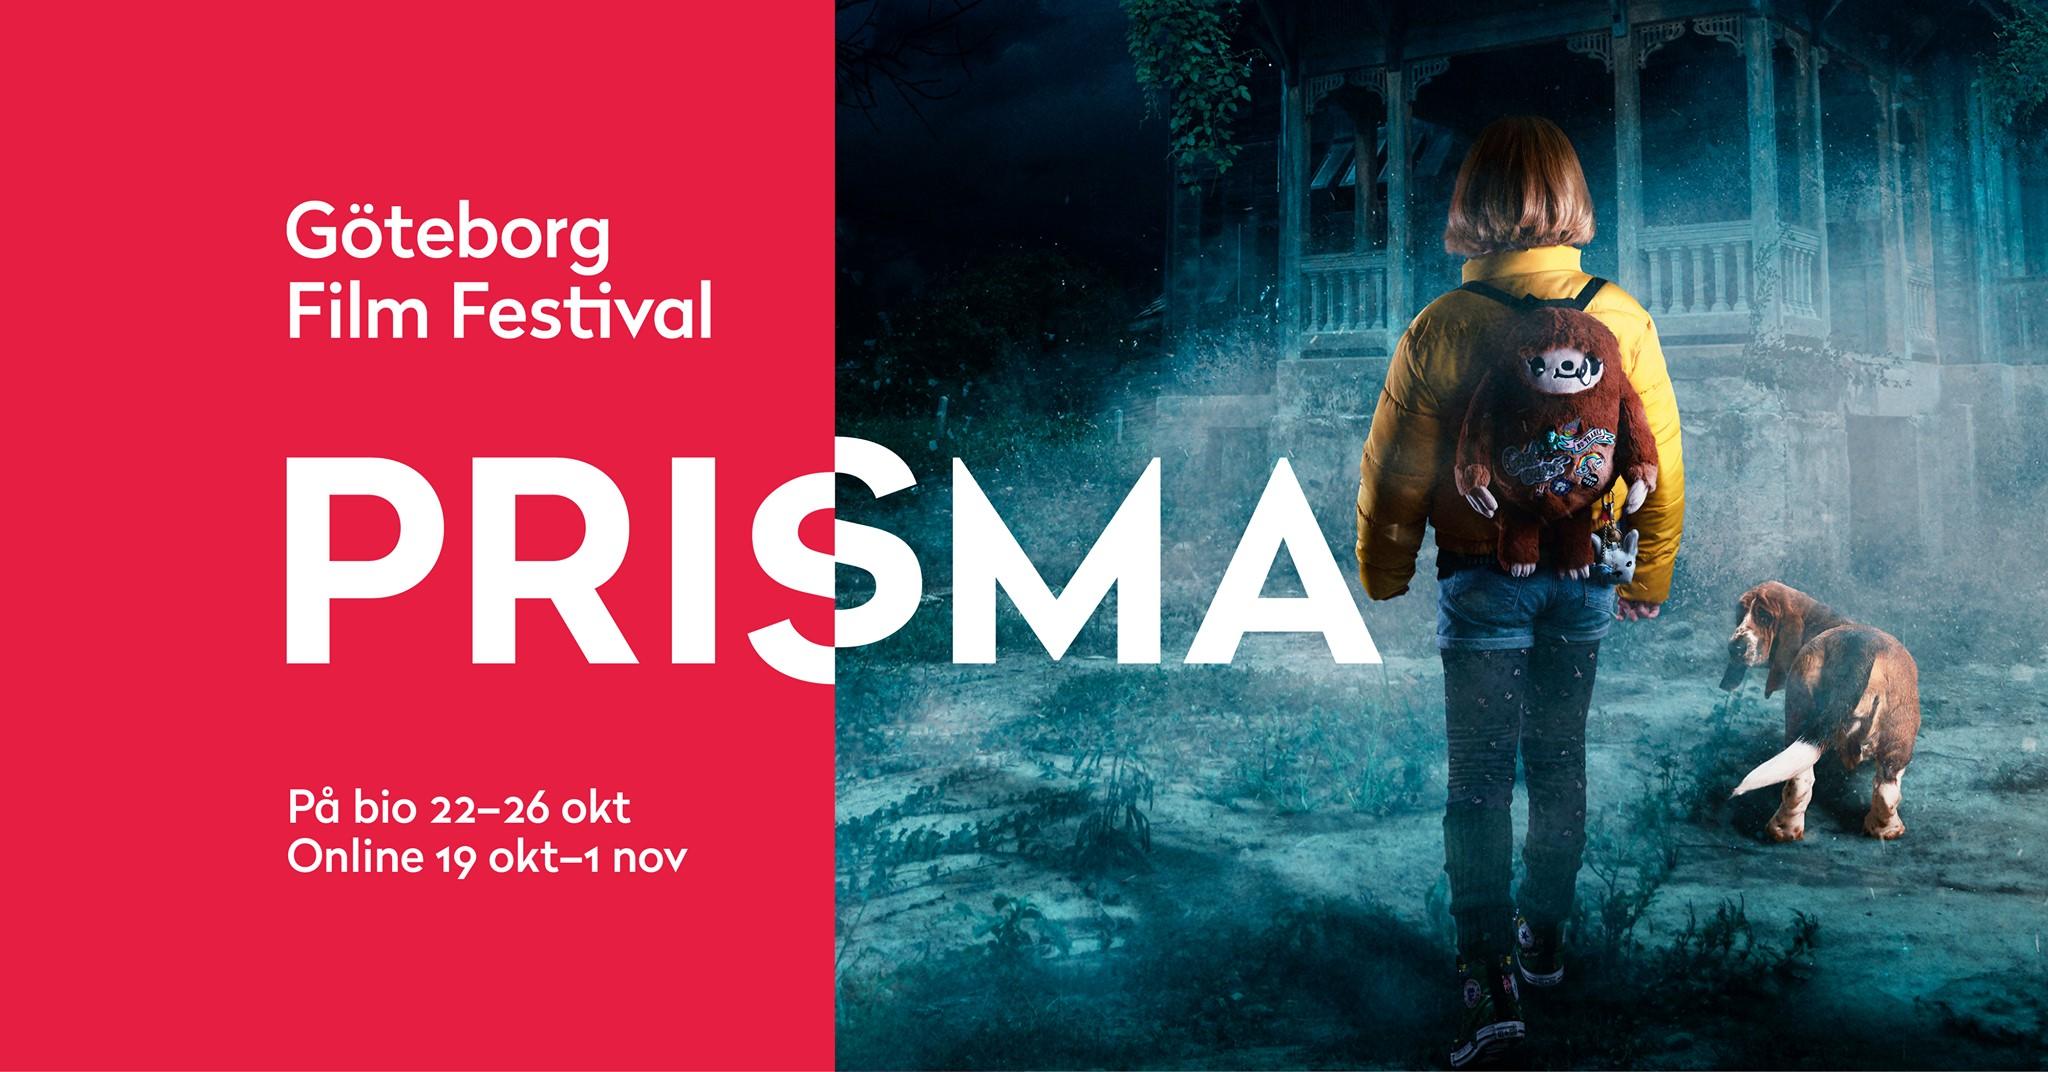 Göteborgs Film Festival Prisma 2020